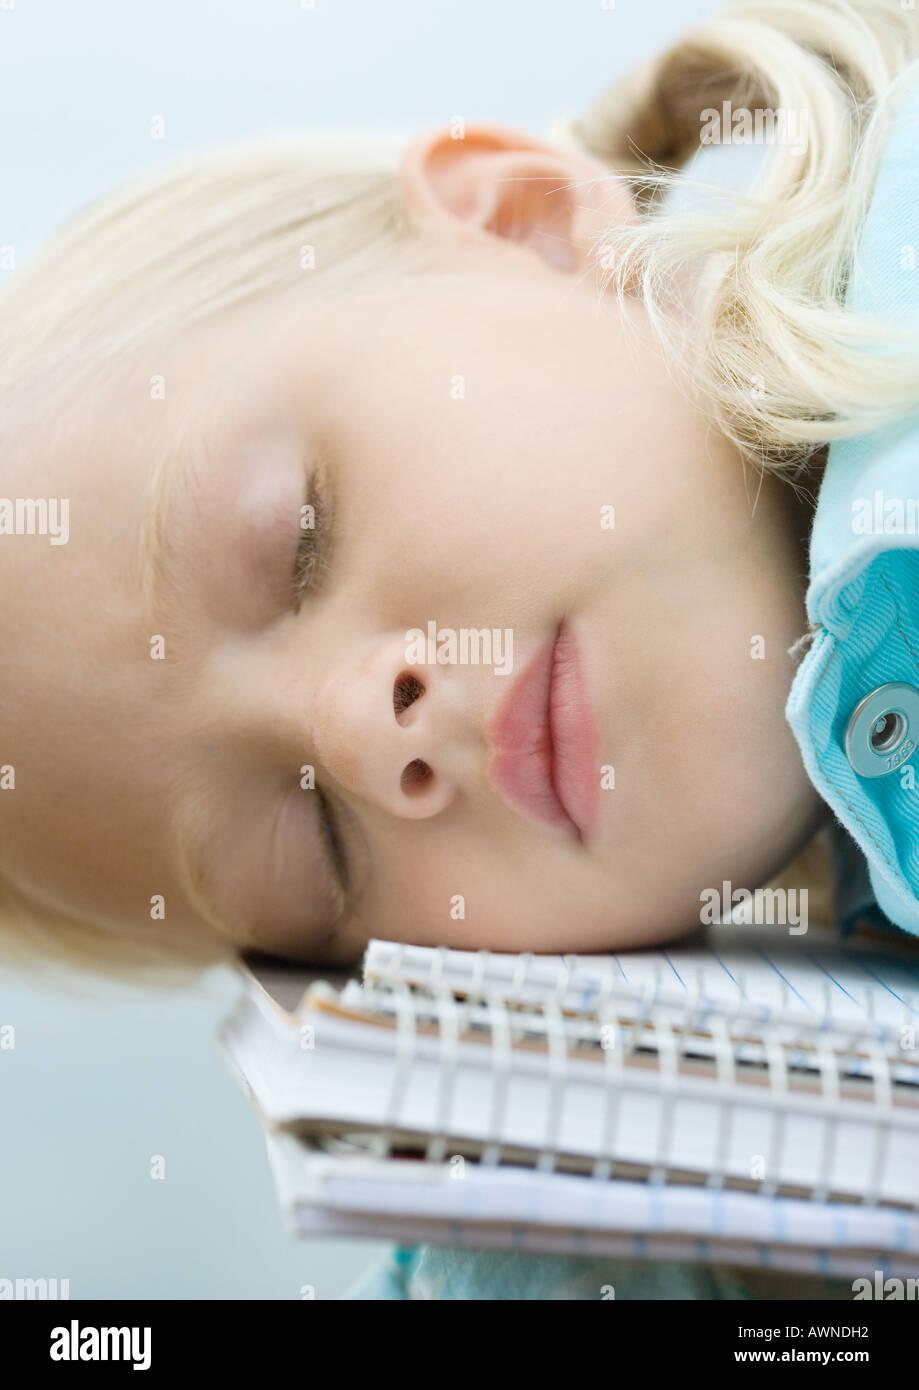 Girl sleeping on notebooks - Stock Image